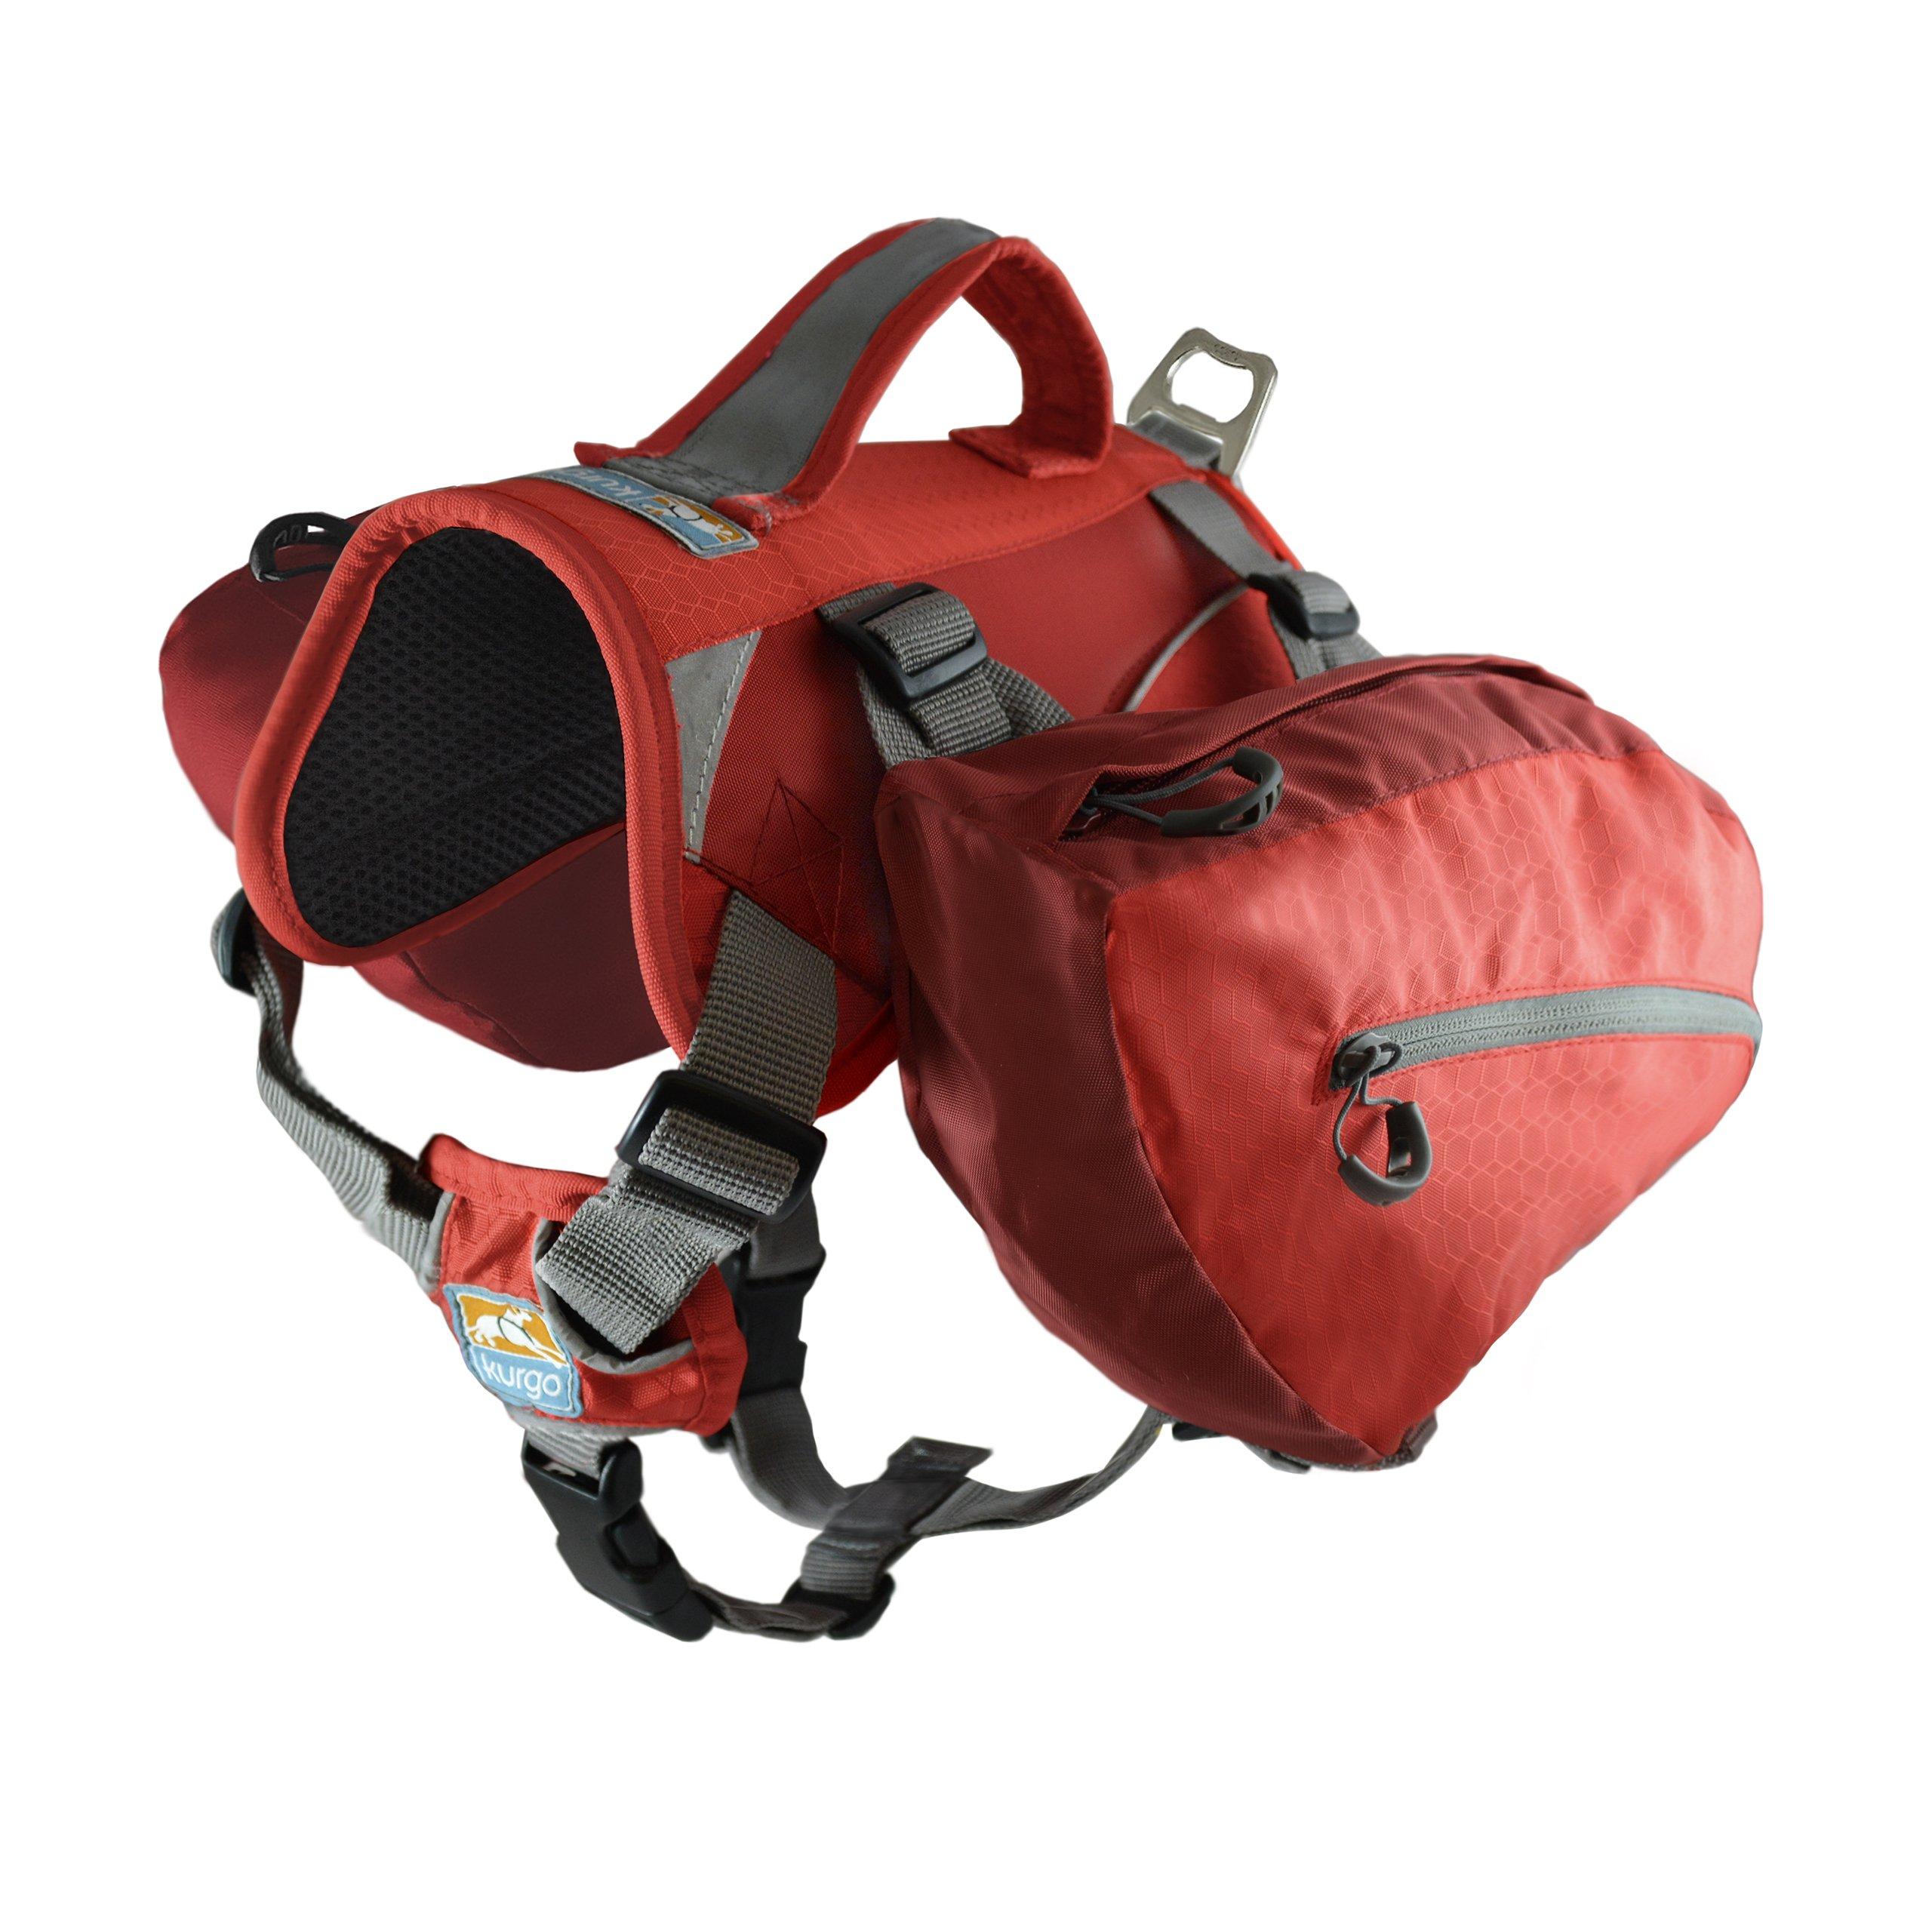 Kurgo Baxter (TM) Dog Backpack for Hiking, Walking or Camping, Barn Red